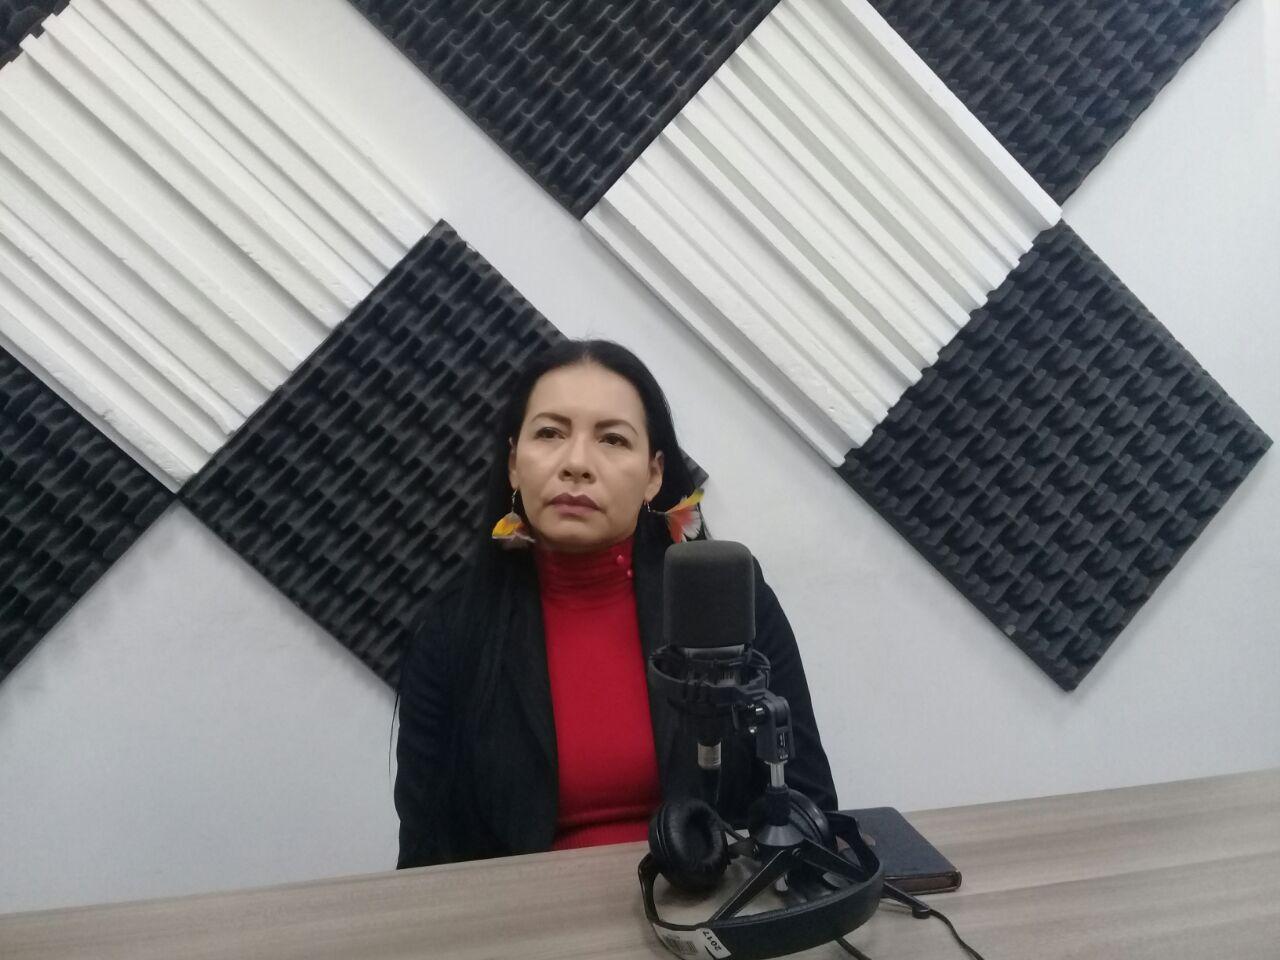 Diana Atamaint y Mariangel Muñoz: Consulta popular